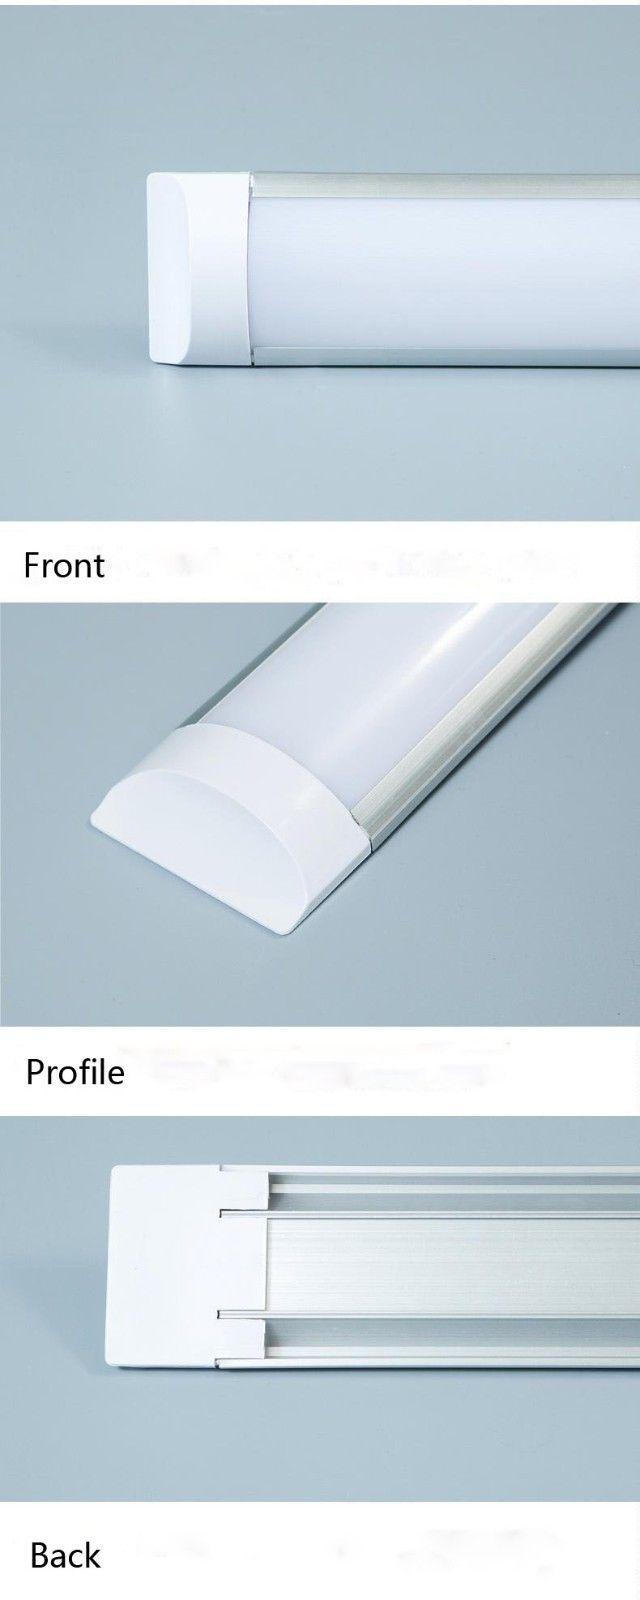 US $149 0  2ft 3ft 4ft Integration LED batten light Explosion Proof dust  proof Ceiling lamp Purification lights fixture 600mm 1200mm 900mm-in LED